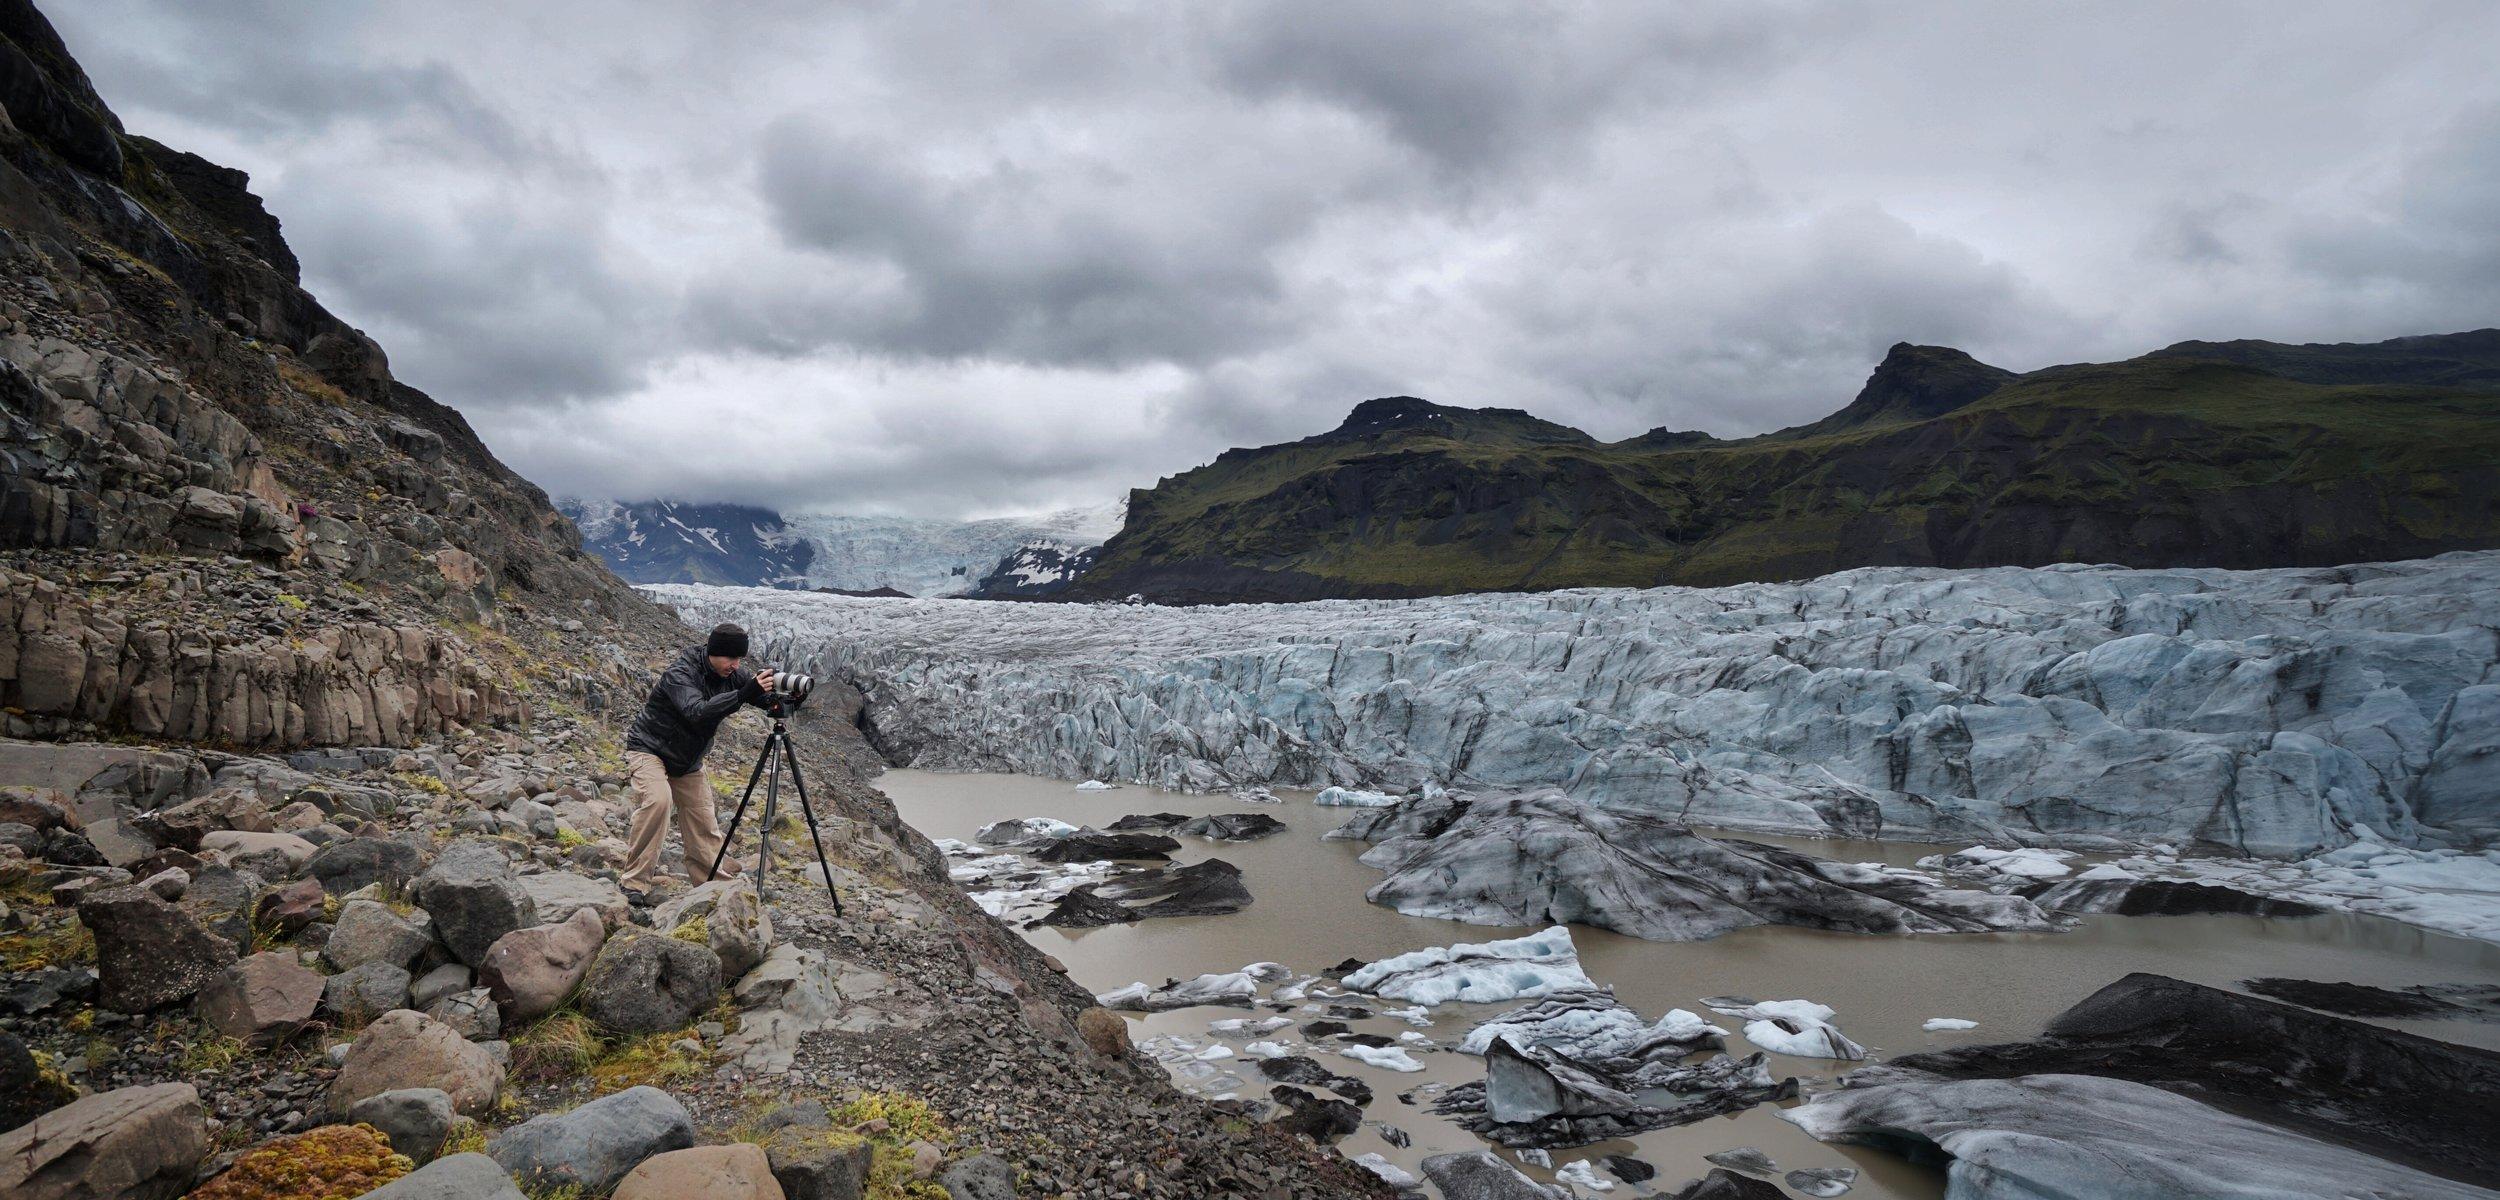 Copy of Kevin Shahinian   Svinafallsjokull, Iceland